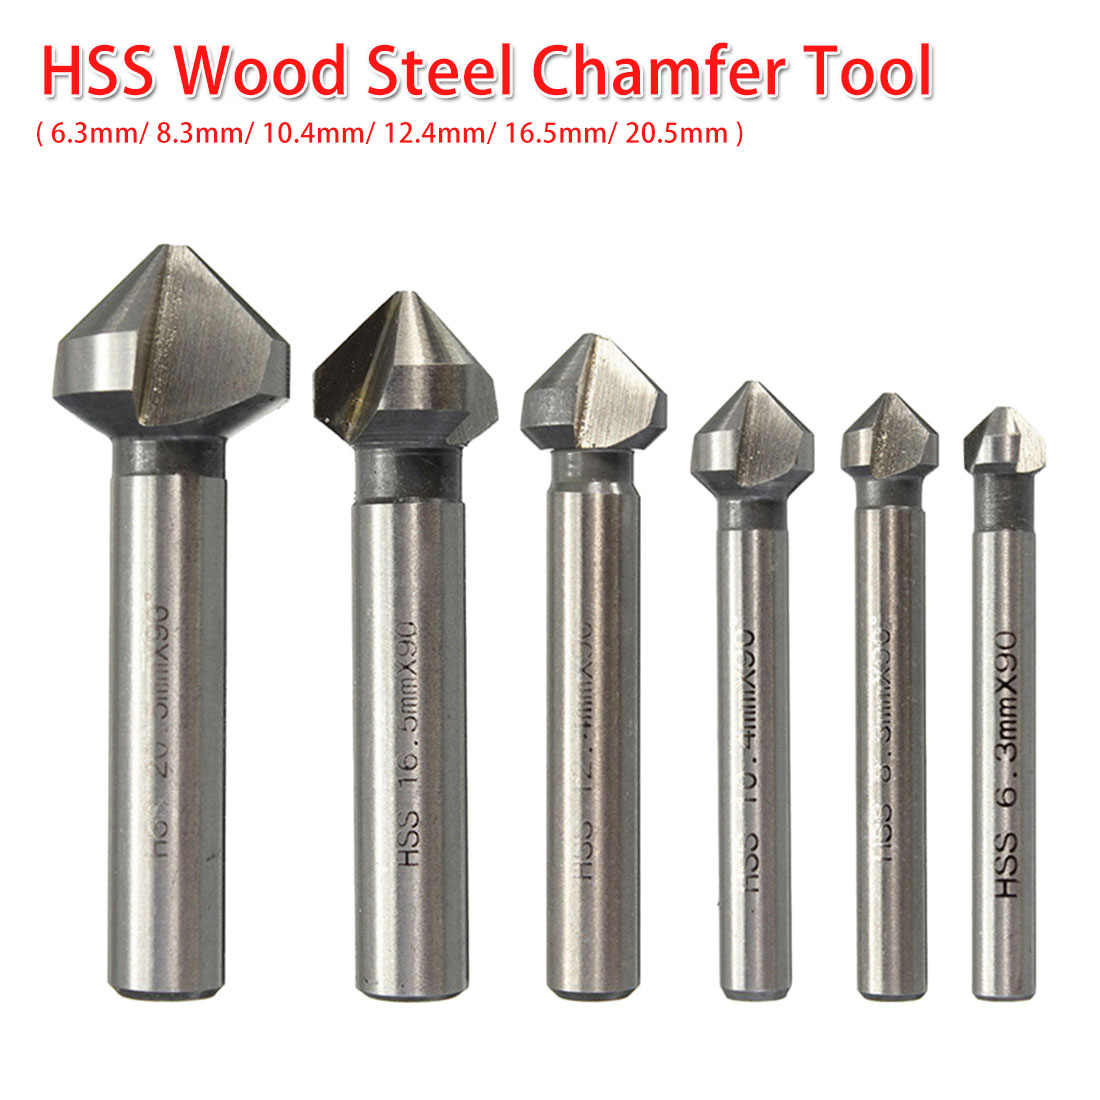 Steel Countersink Drill Bit Hand Power Tools Three Edge Chamfer Cutter Tool